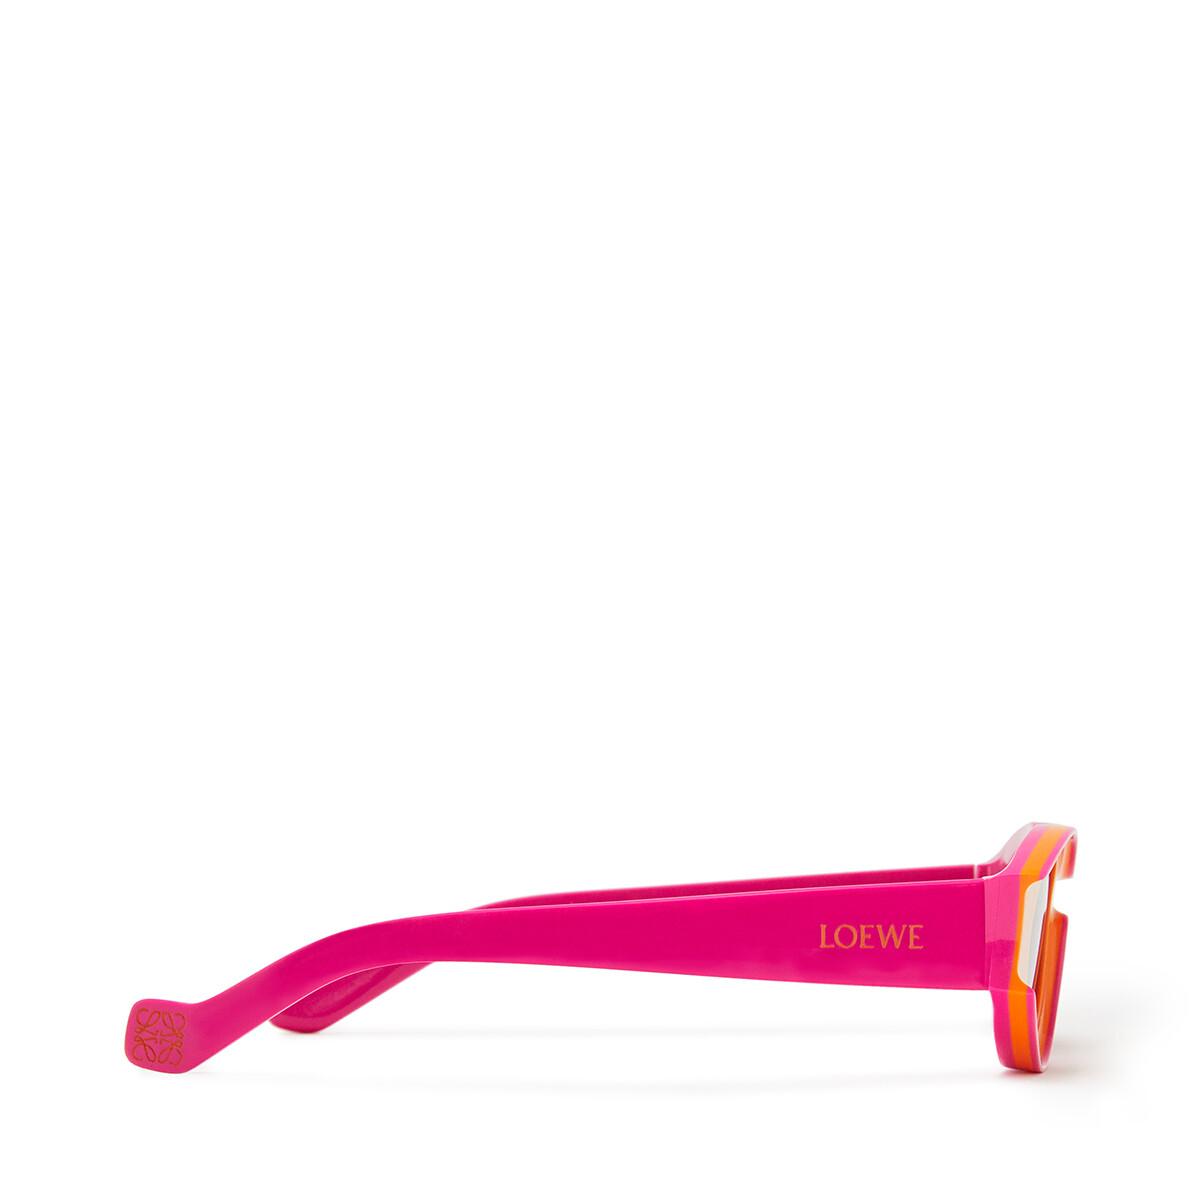 LOEWE Gafas De Sol Pequeñas Paula's Ibiza De Acetato Naranja Neon/Rosa Neon front